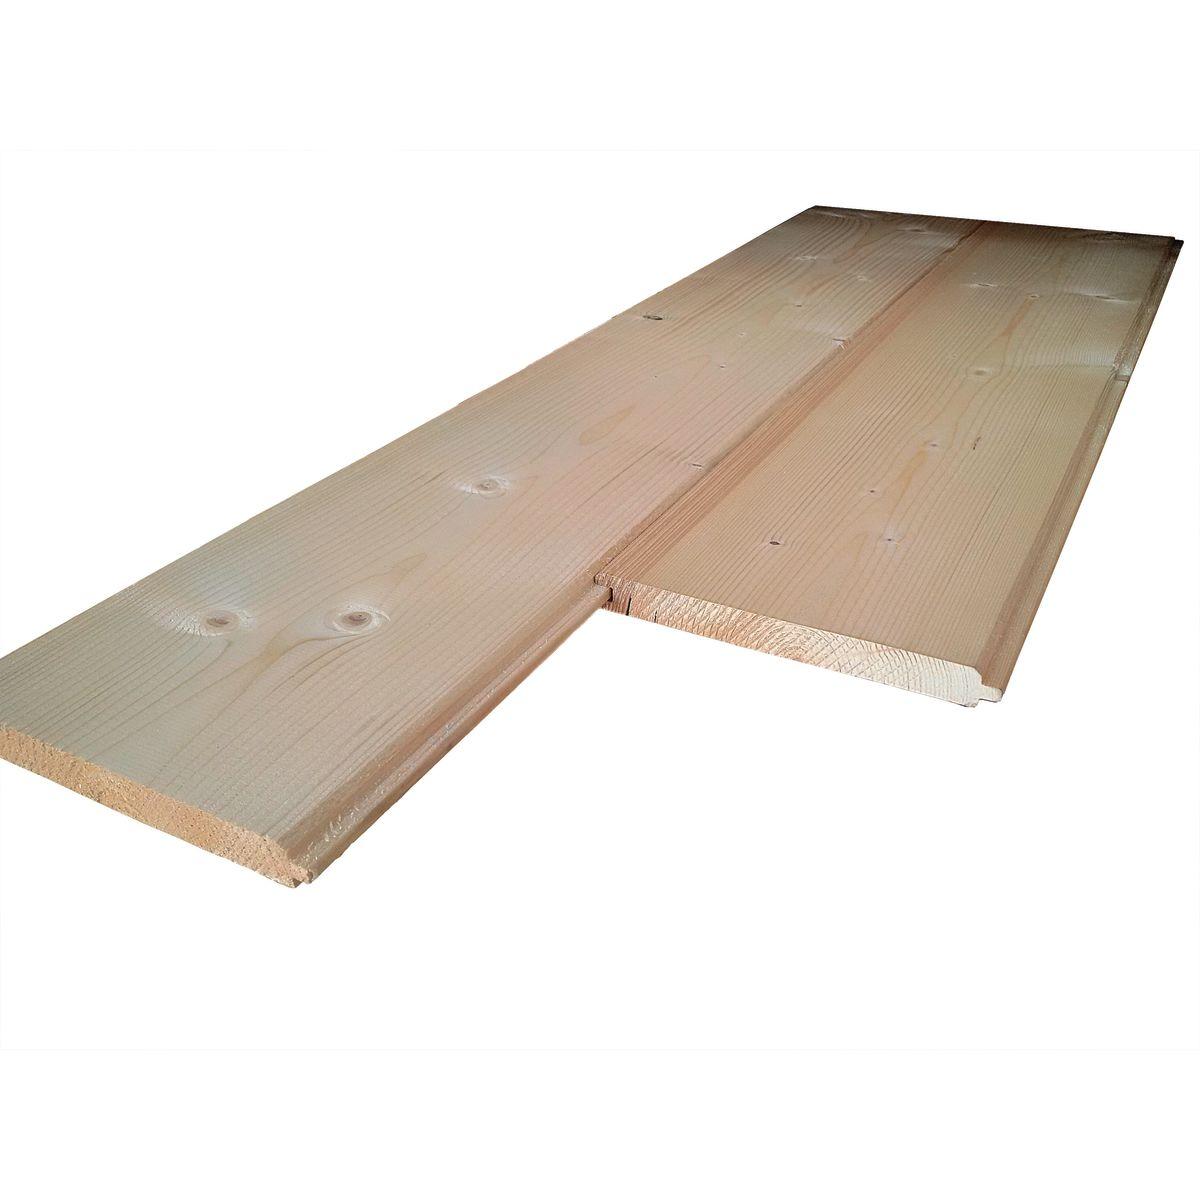 Beautiful tavole in legno grezzo photos acrylicgiftware - Offerte leroy merlin palermo ...